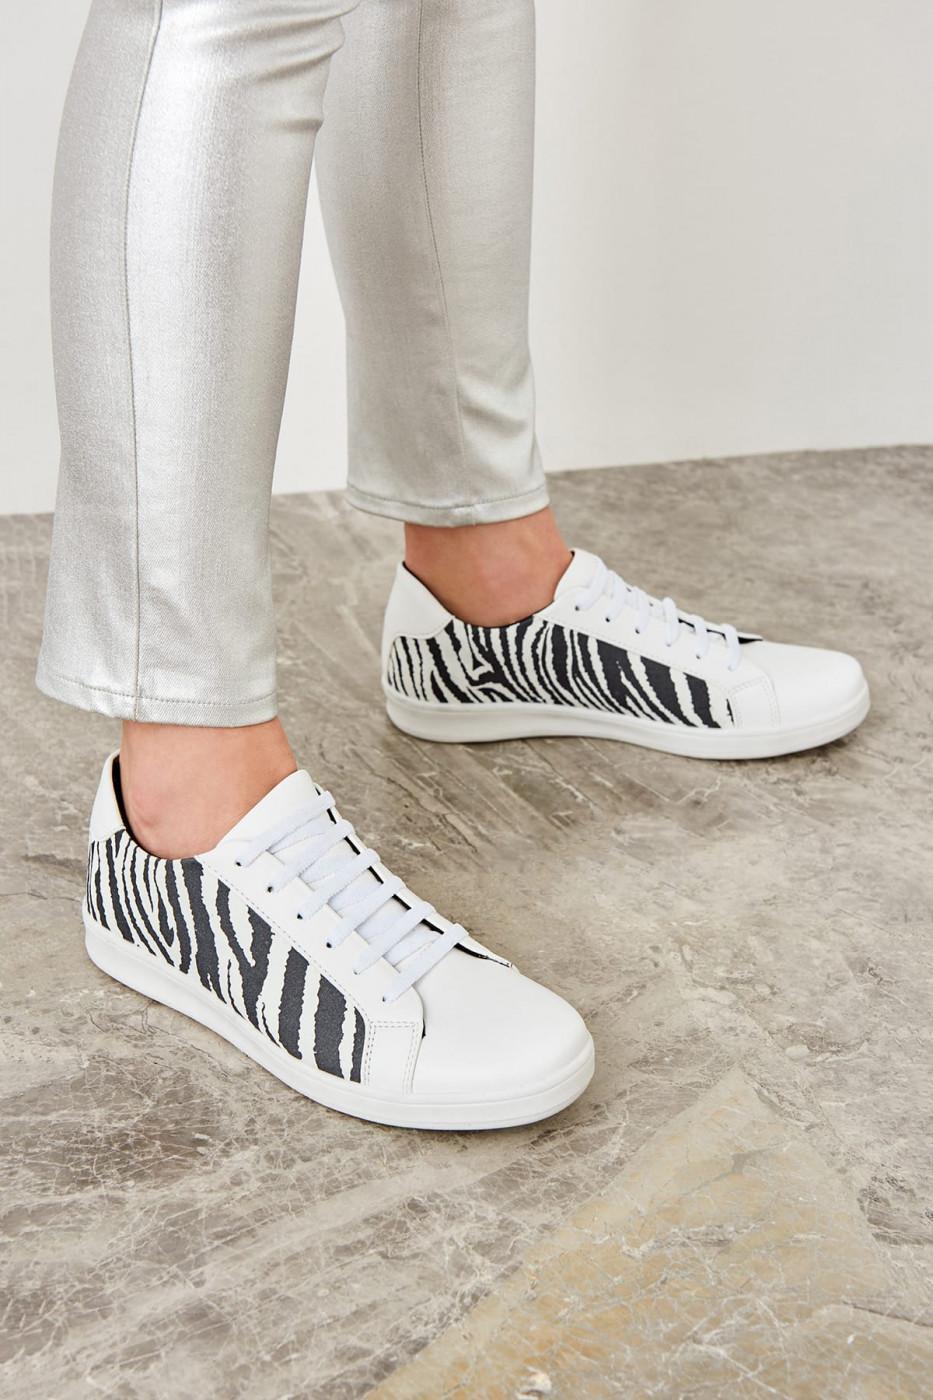 Trendyol White Zebra-Patterned Women's Sneaker